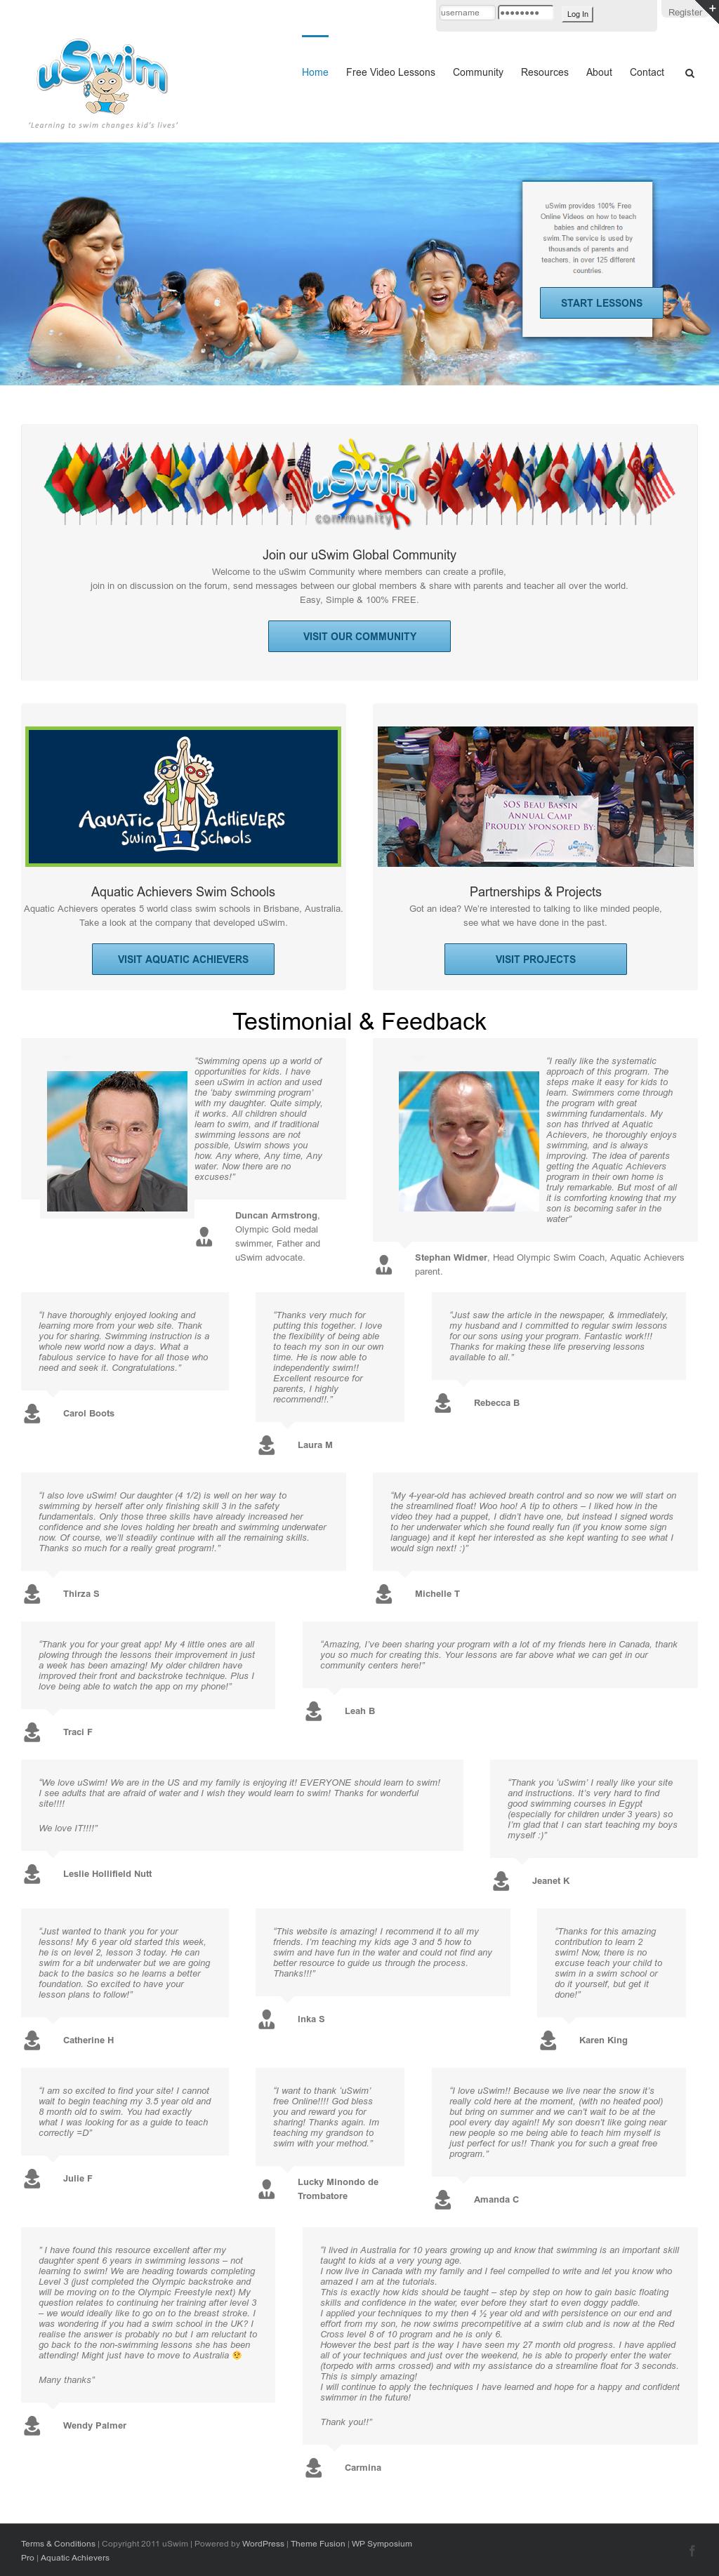 uswim' - Free Online Swim Lessons Competitors, Revenue and